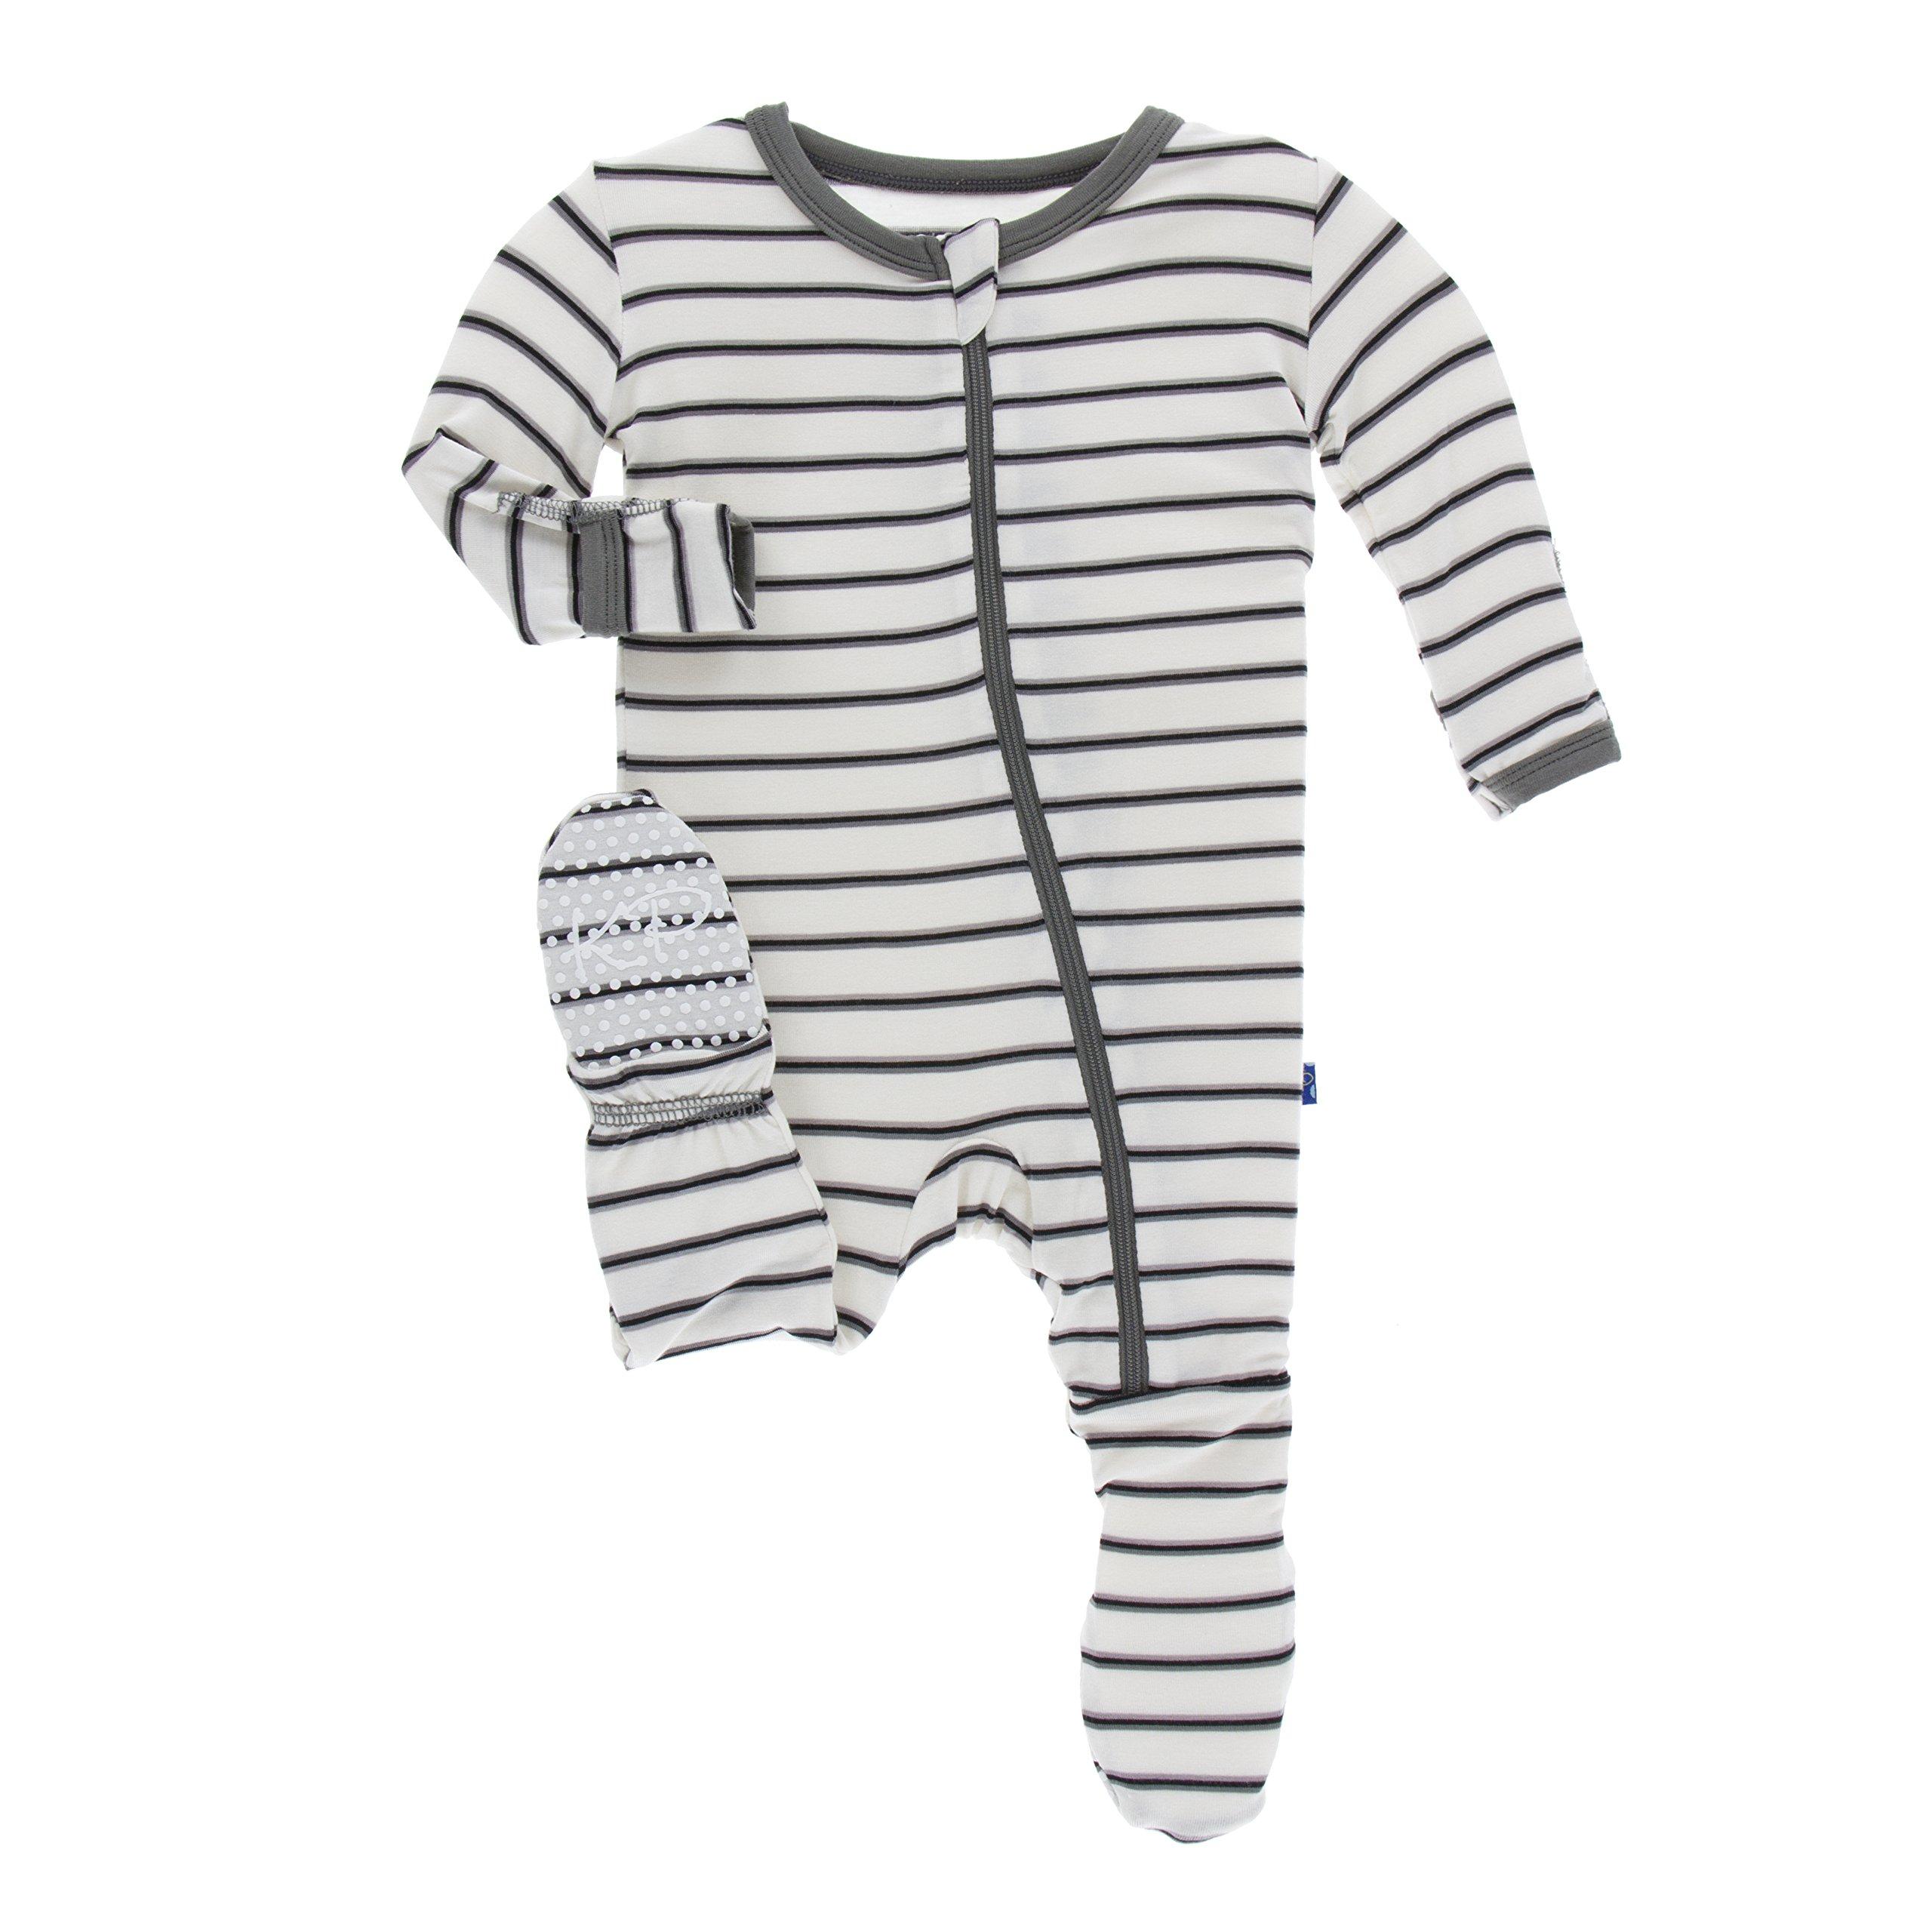 KicKee Pants Little Boys Print Footie with Zipper - Neutral Parisian Stripe, 18-24 Months